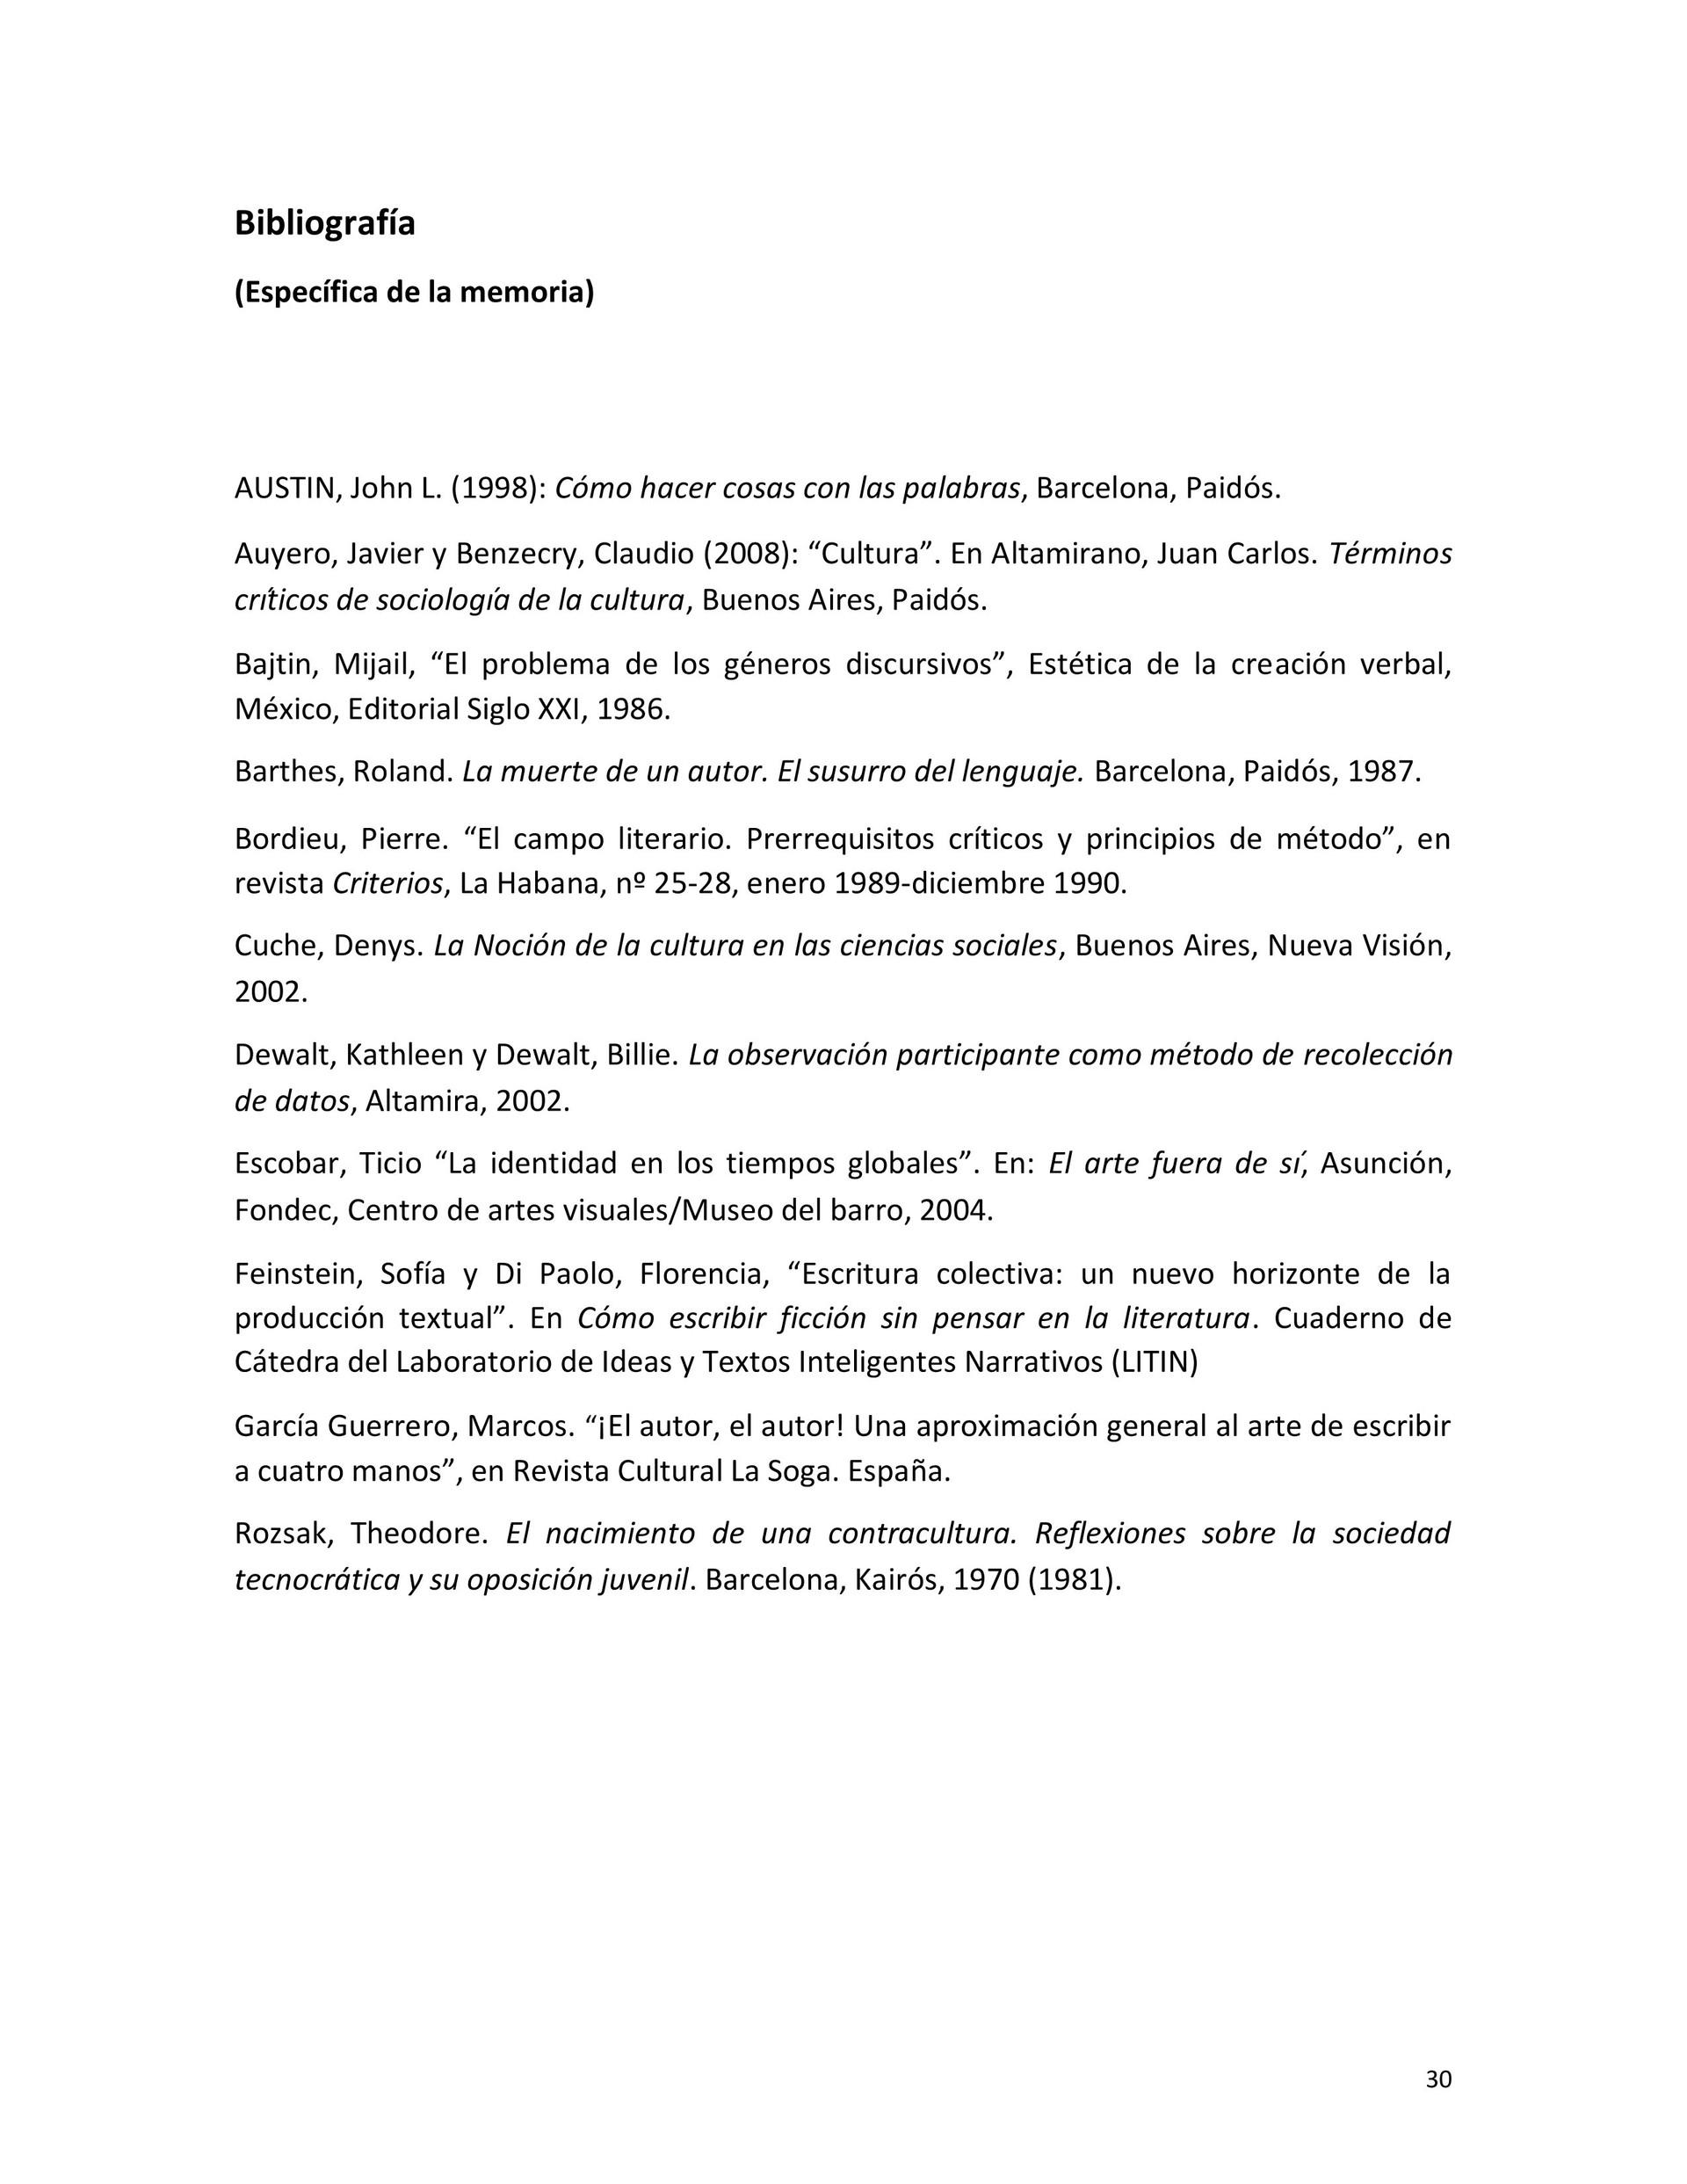 estacion_Page_29.jpeg